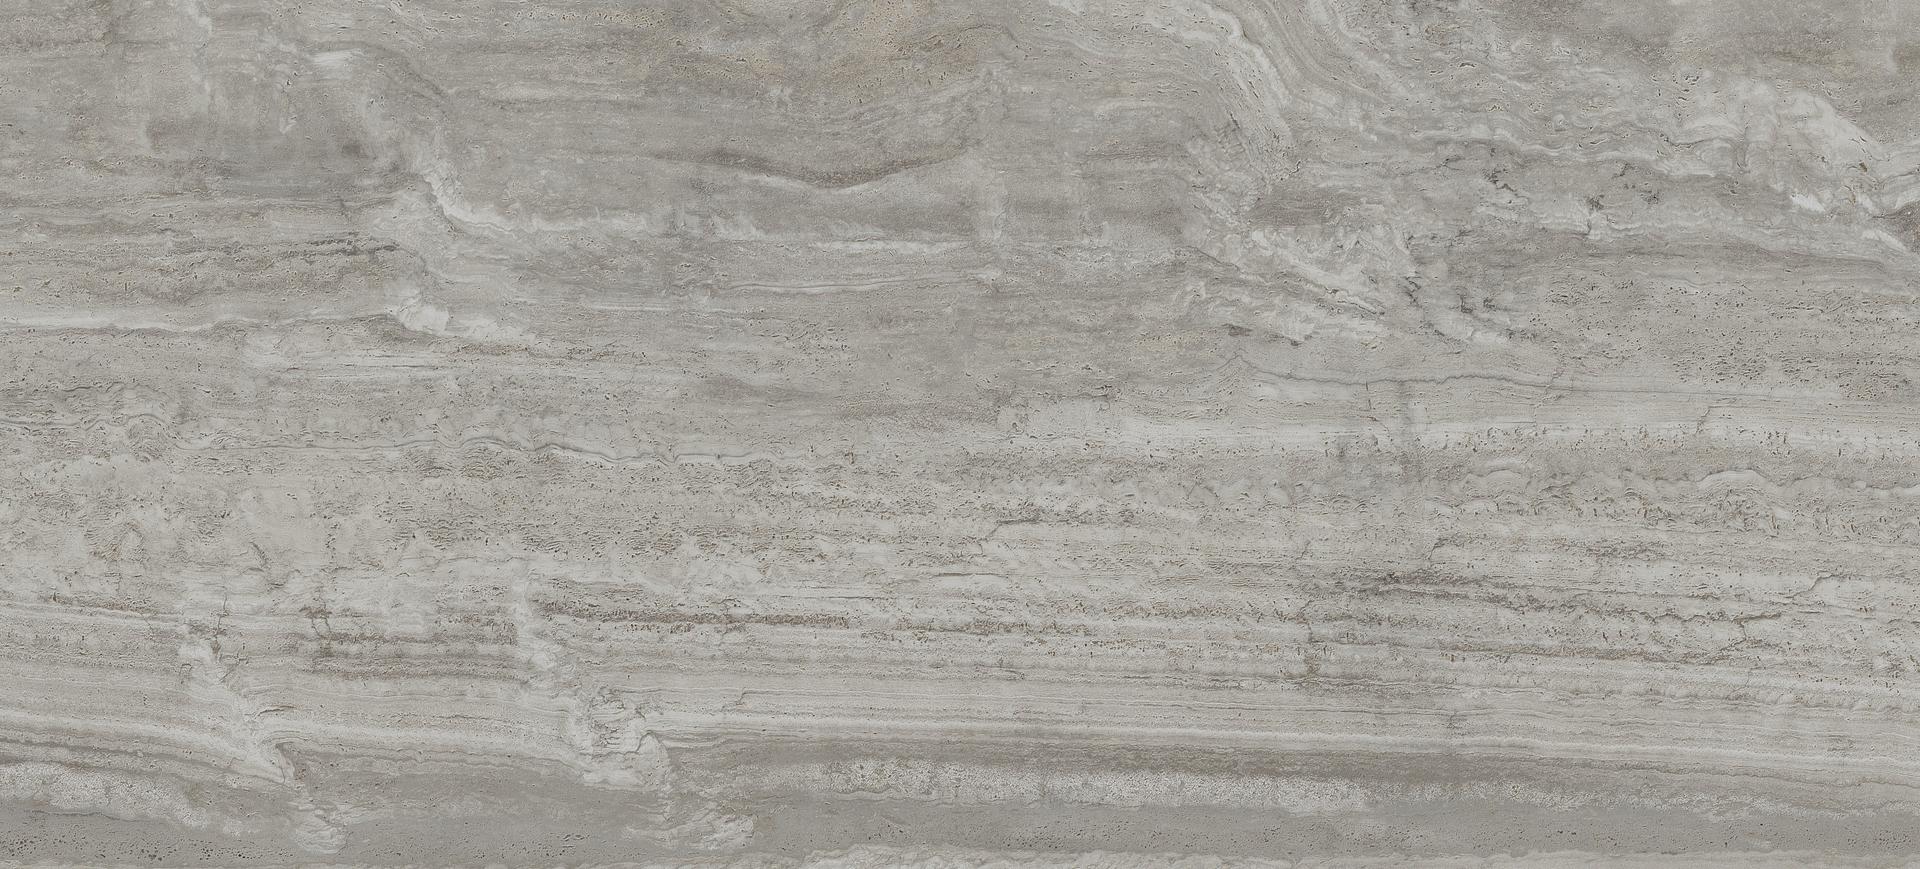 Background tile Navona by Flaviker, Unglazed porcelain stoneware, 120x270 cm, Surface Finish antislip, Effect stone, Color grey,